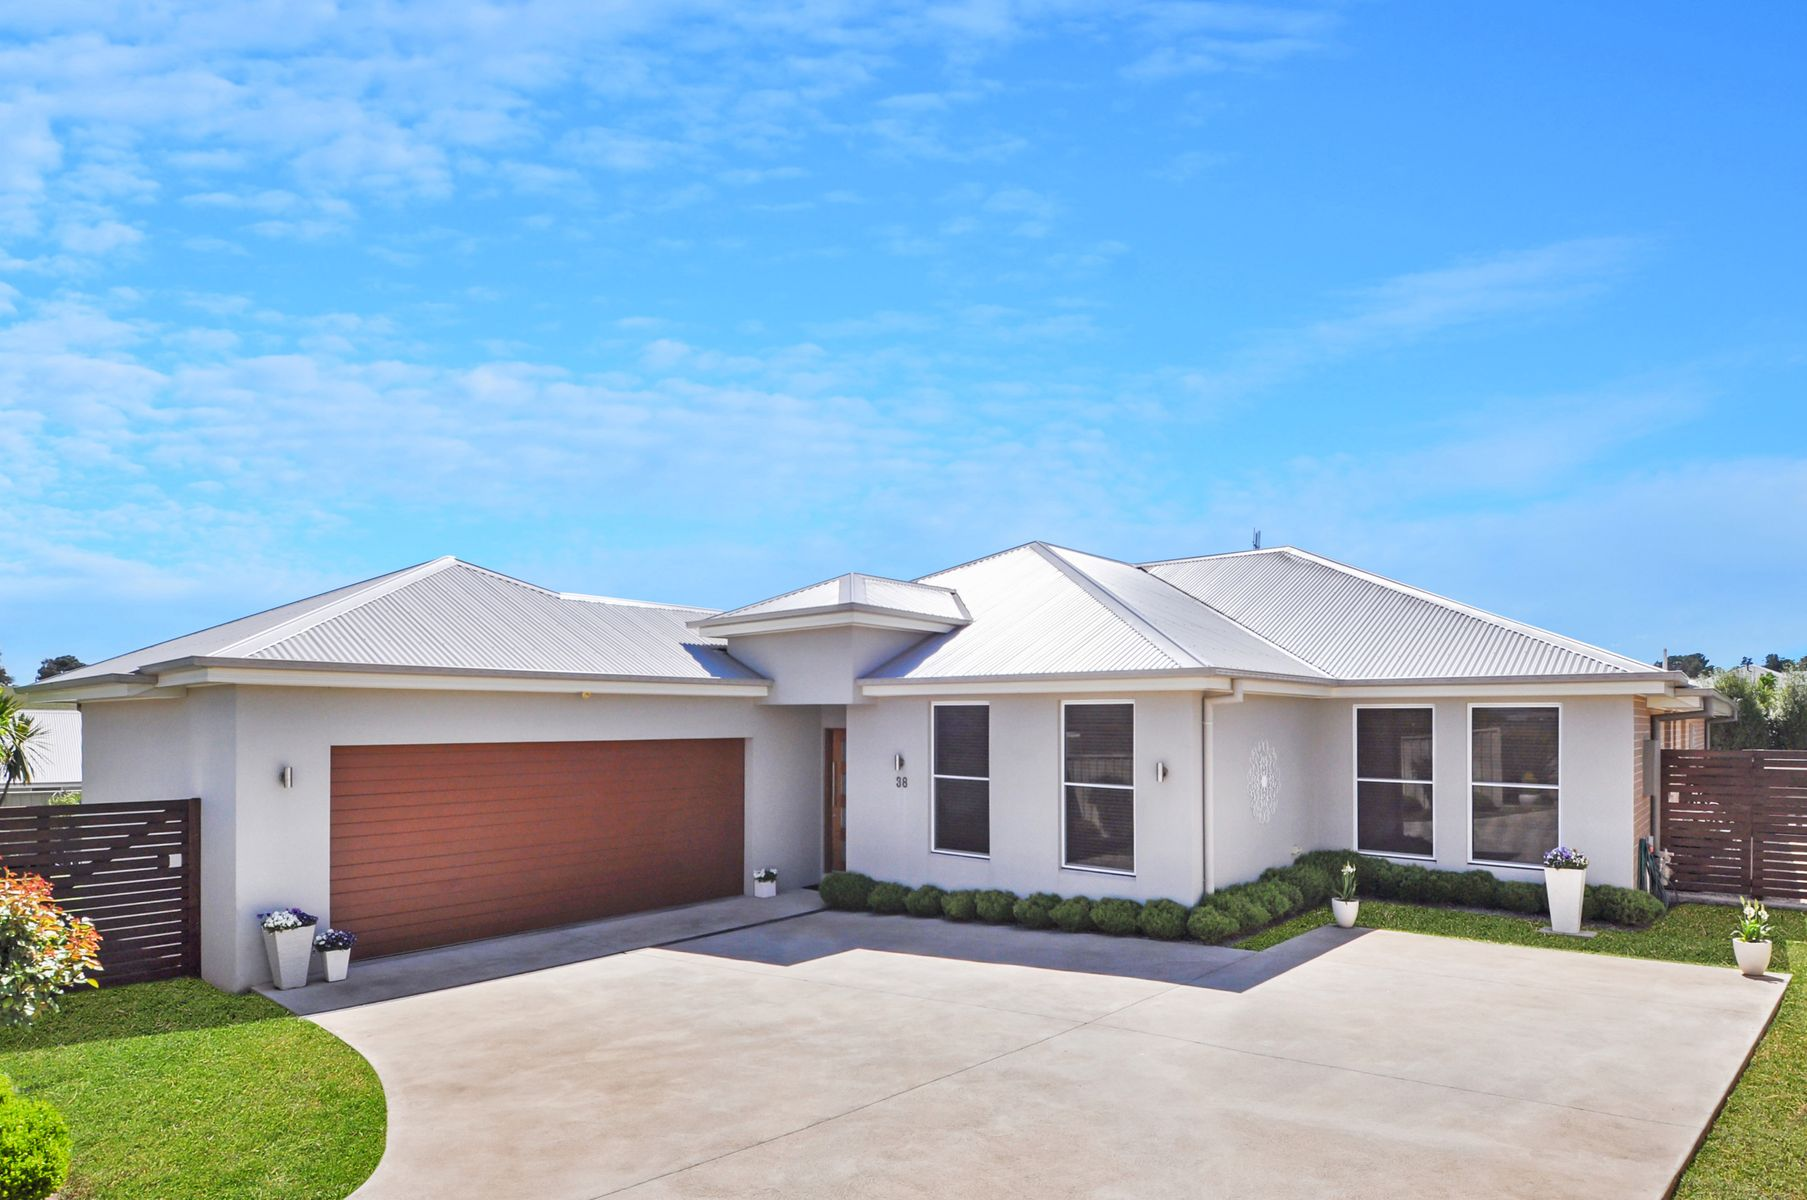 38 Cheviot Drive, Kelso, NSW 2795